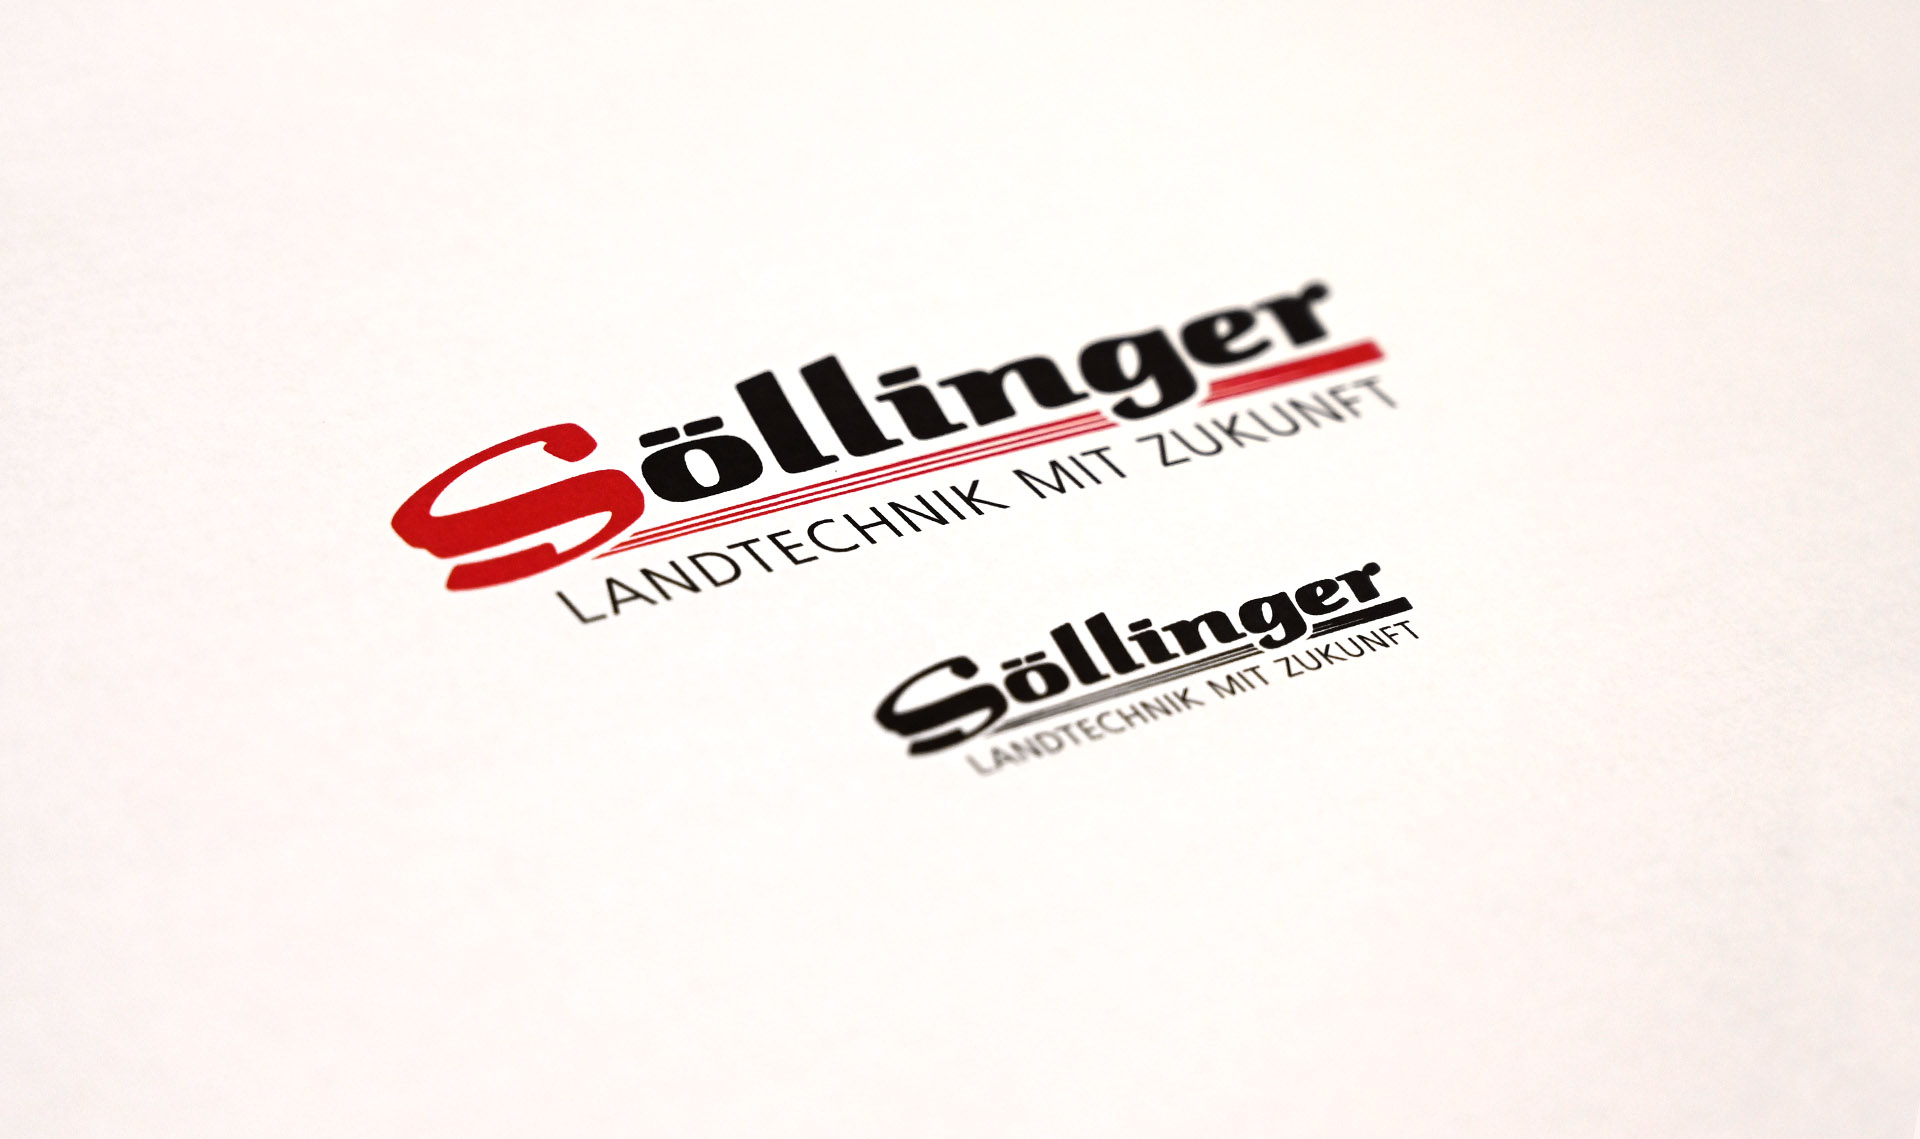 söllinger-landtechnik-image-1